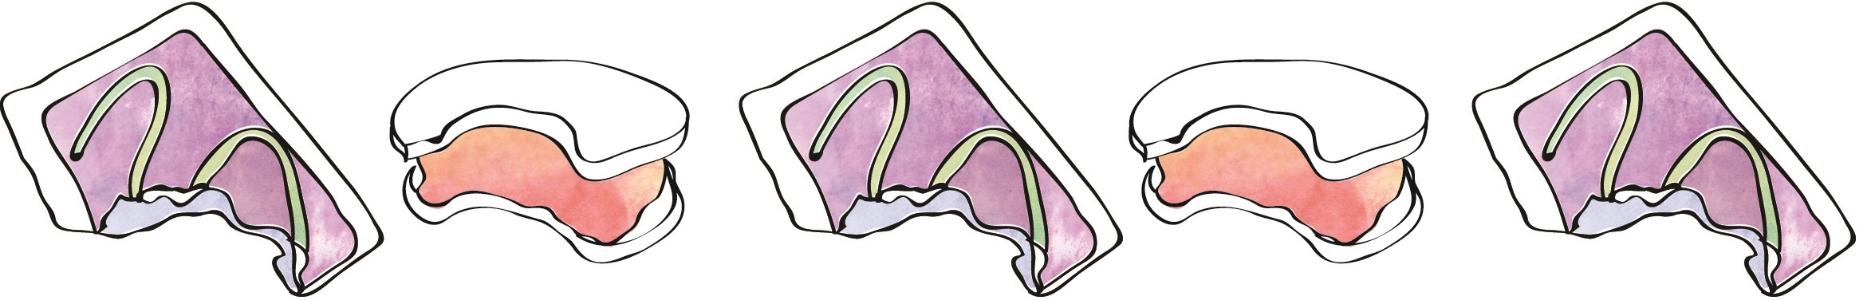 original Sweet Sandies logo - illustrated ice cream sandwich & tart doodles by Stephanie